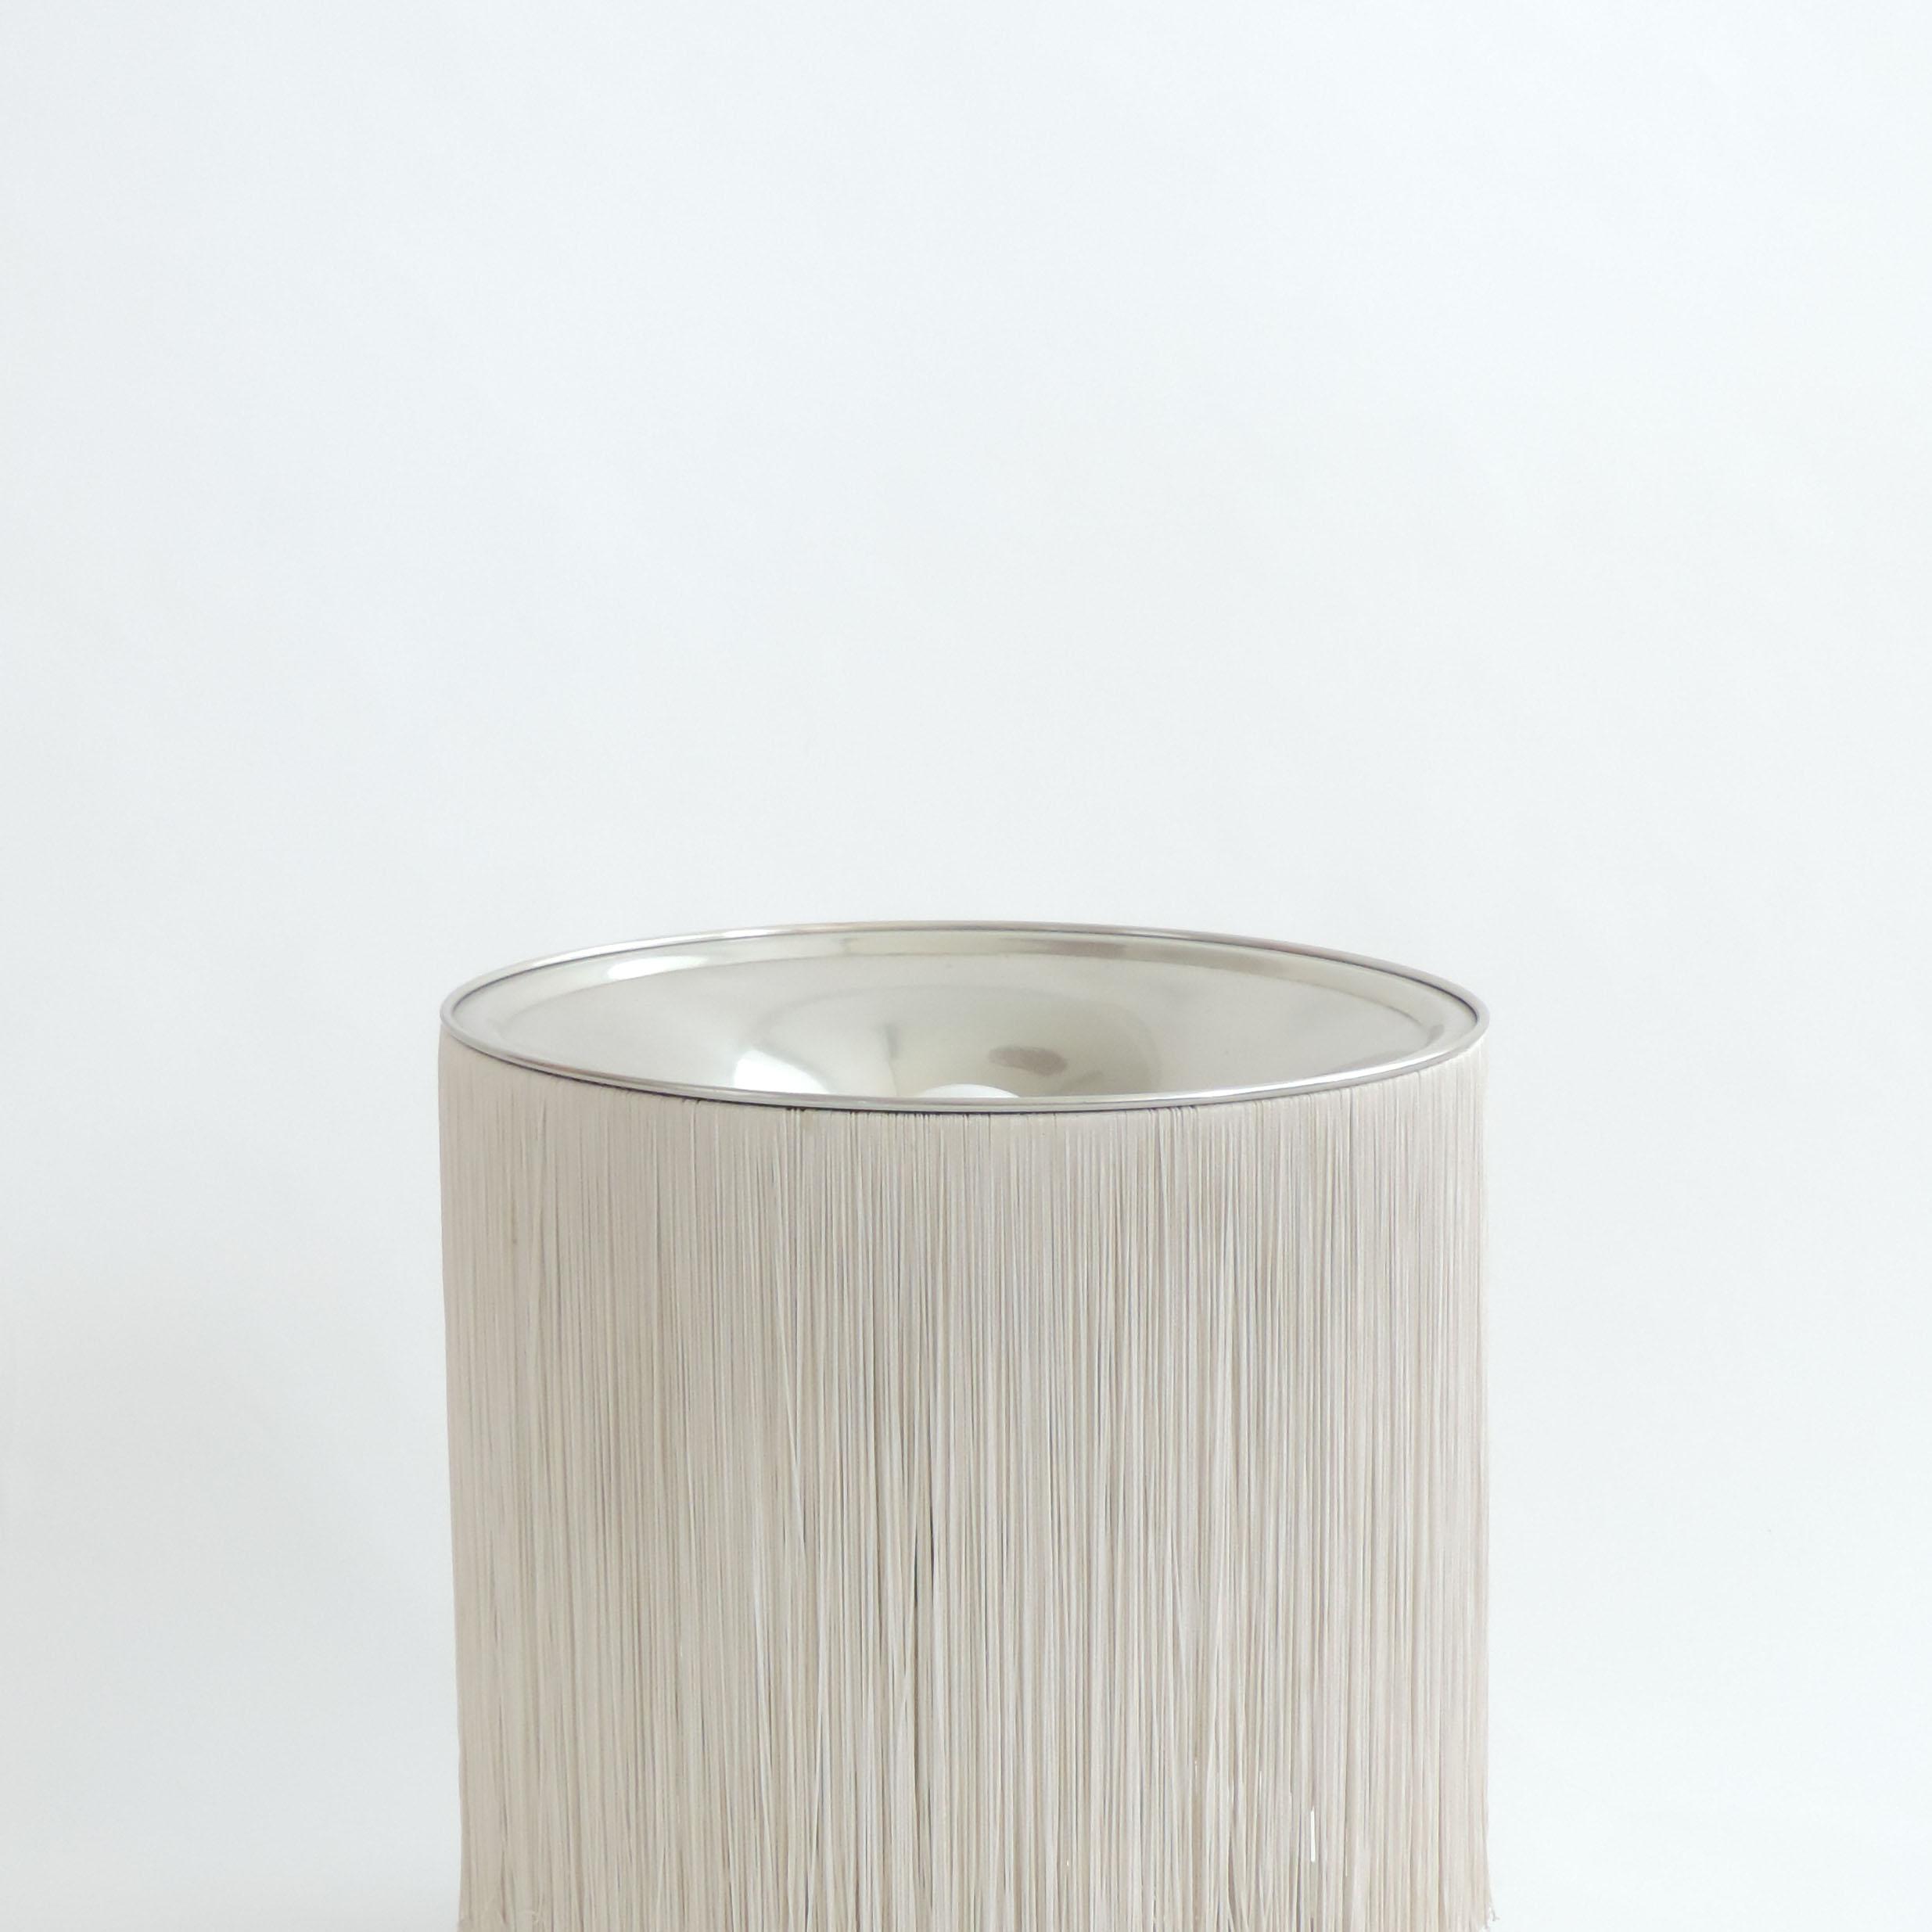 gianfranco frattini, arteluce, italian design, design masters, modernariato